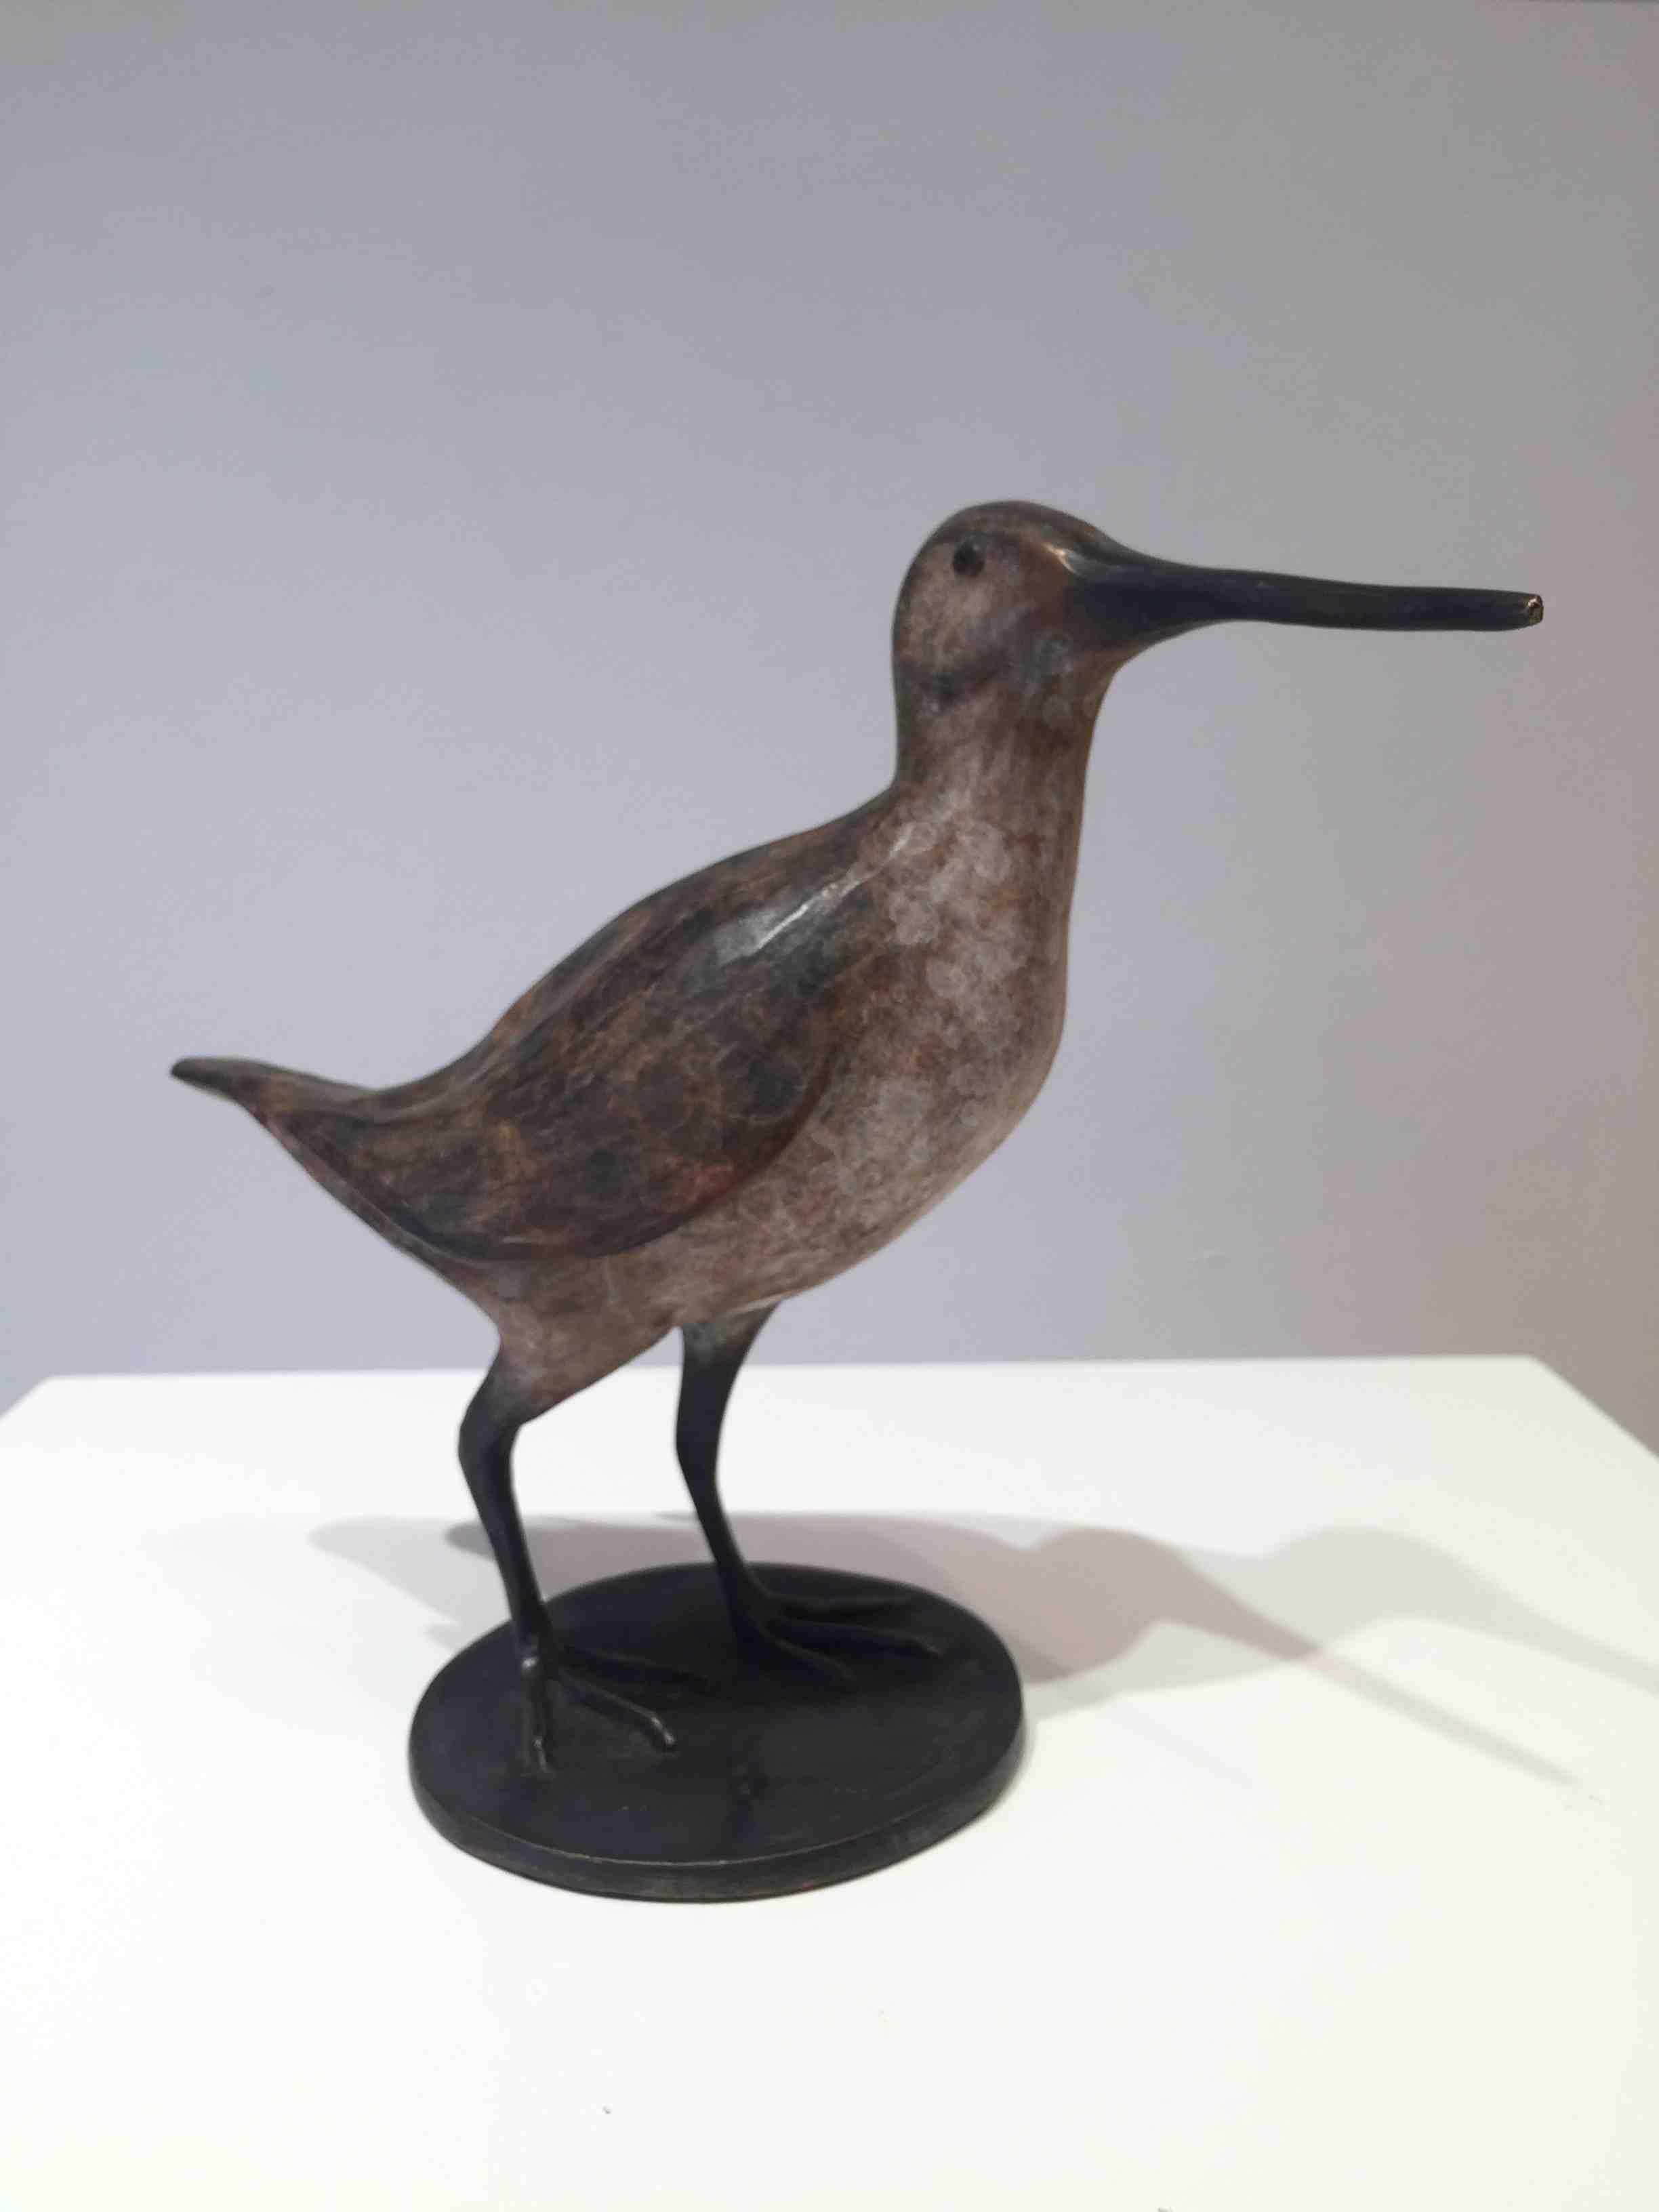 Fiona Smith, Snipe, bronze, AP, 21 x 24 x 11 cm